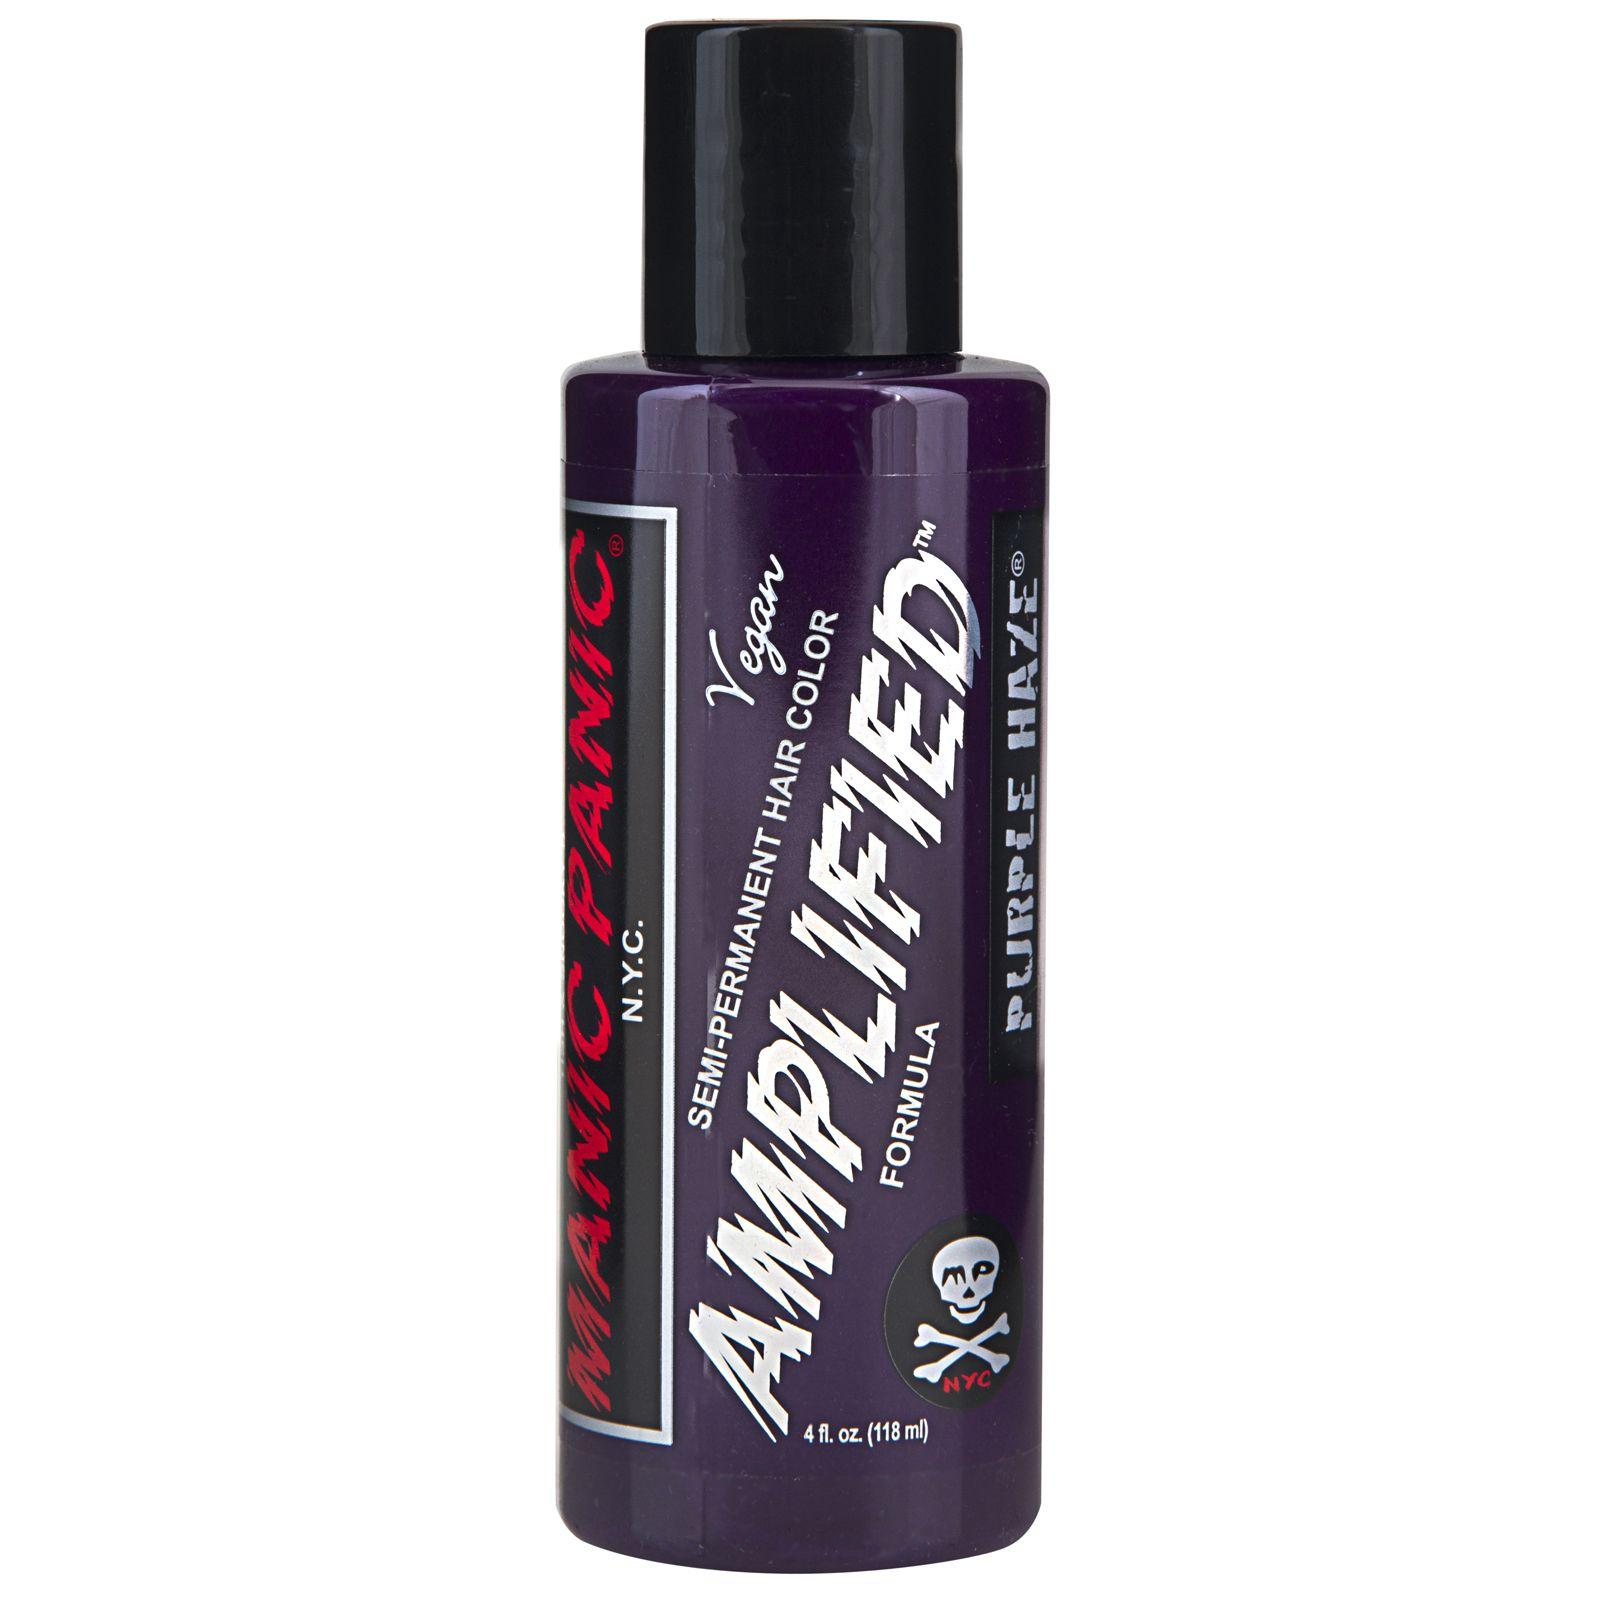 Manic Panic Amplified Semi Permanent Cream Hair Dye Vegan 118ml All Colours